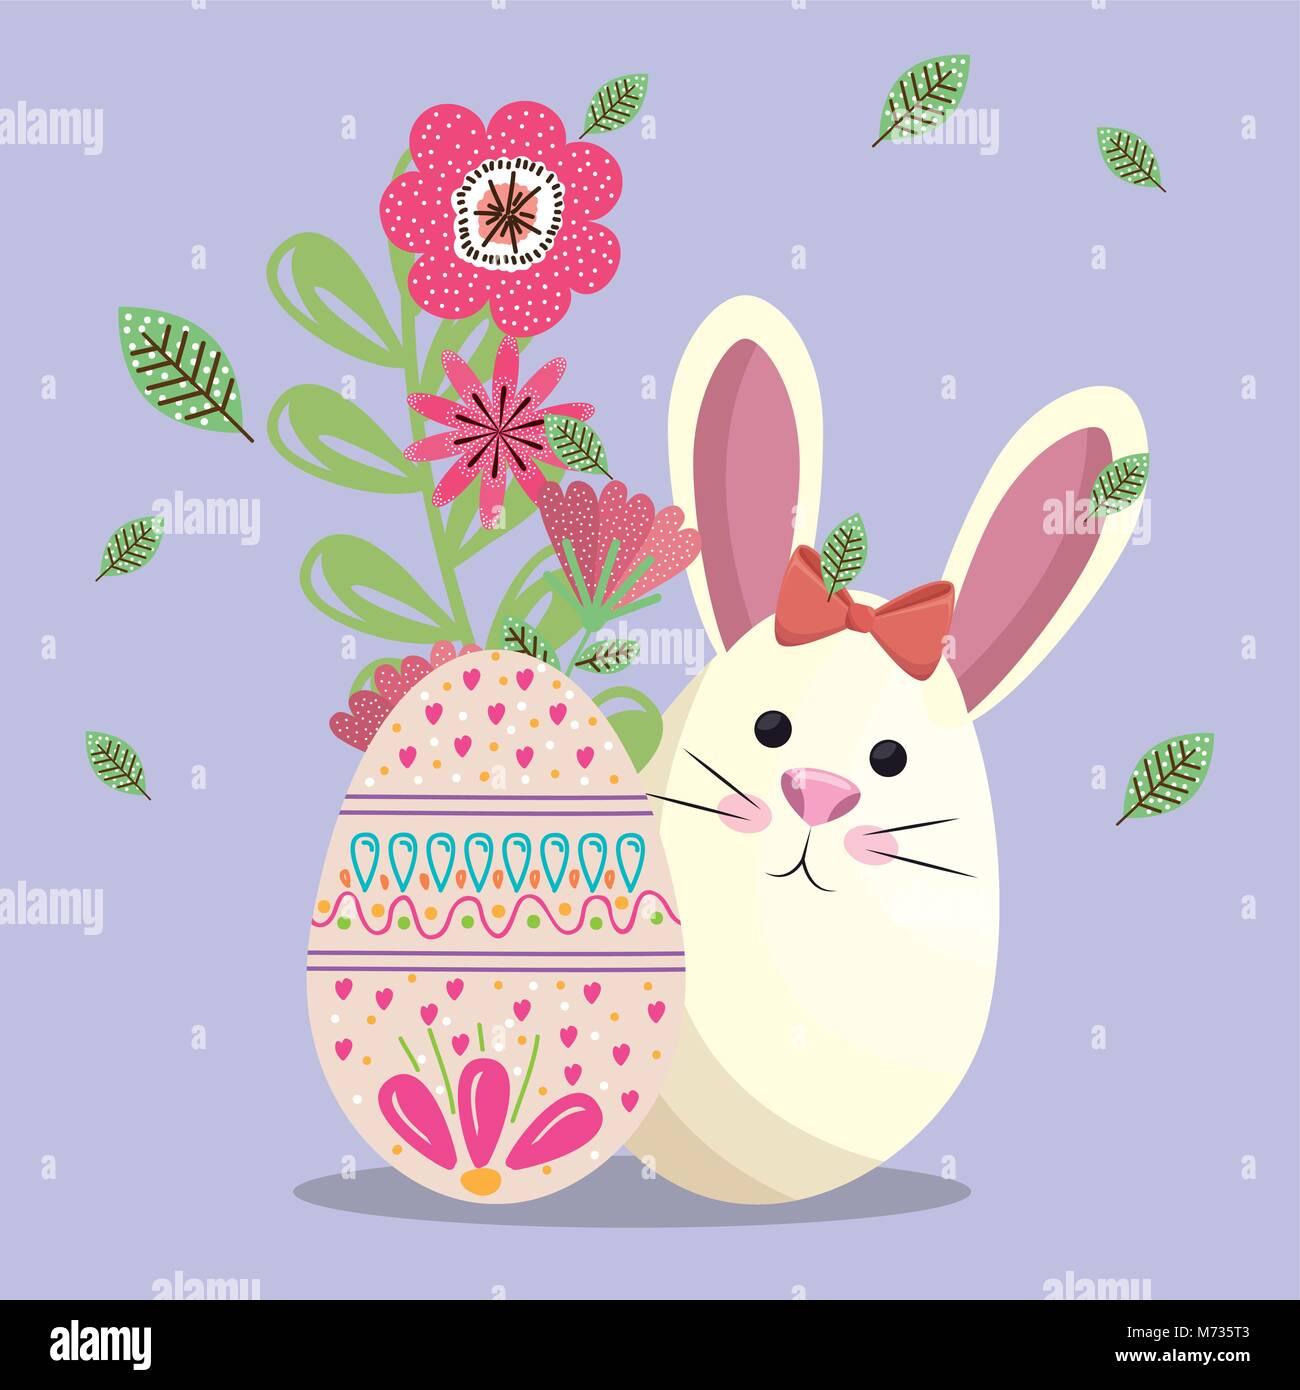 Niedliche Kaninchen Frohe Ostern Karte Vektor Abbildung Bild